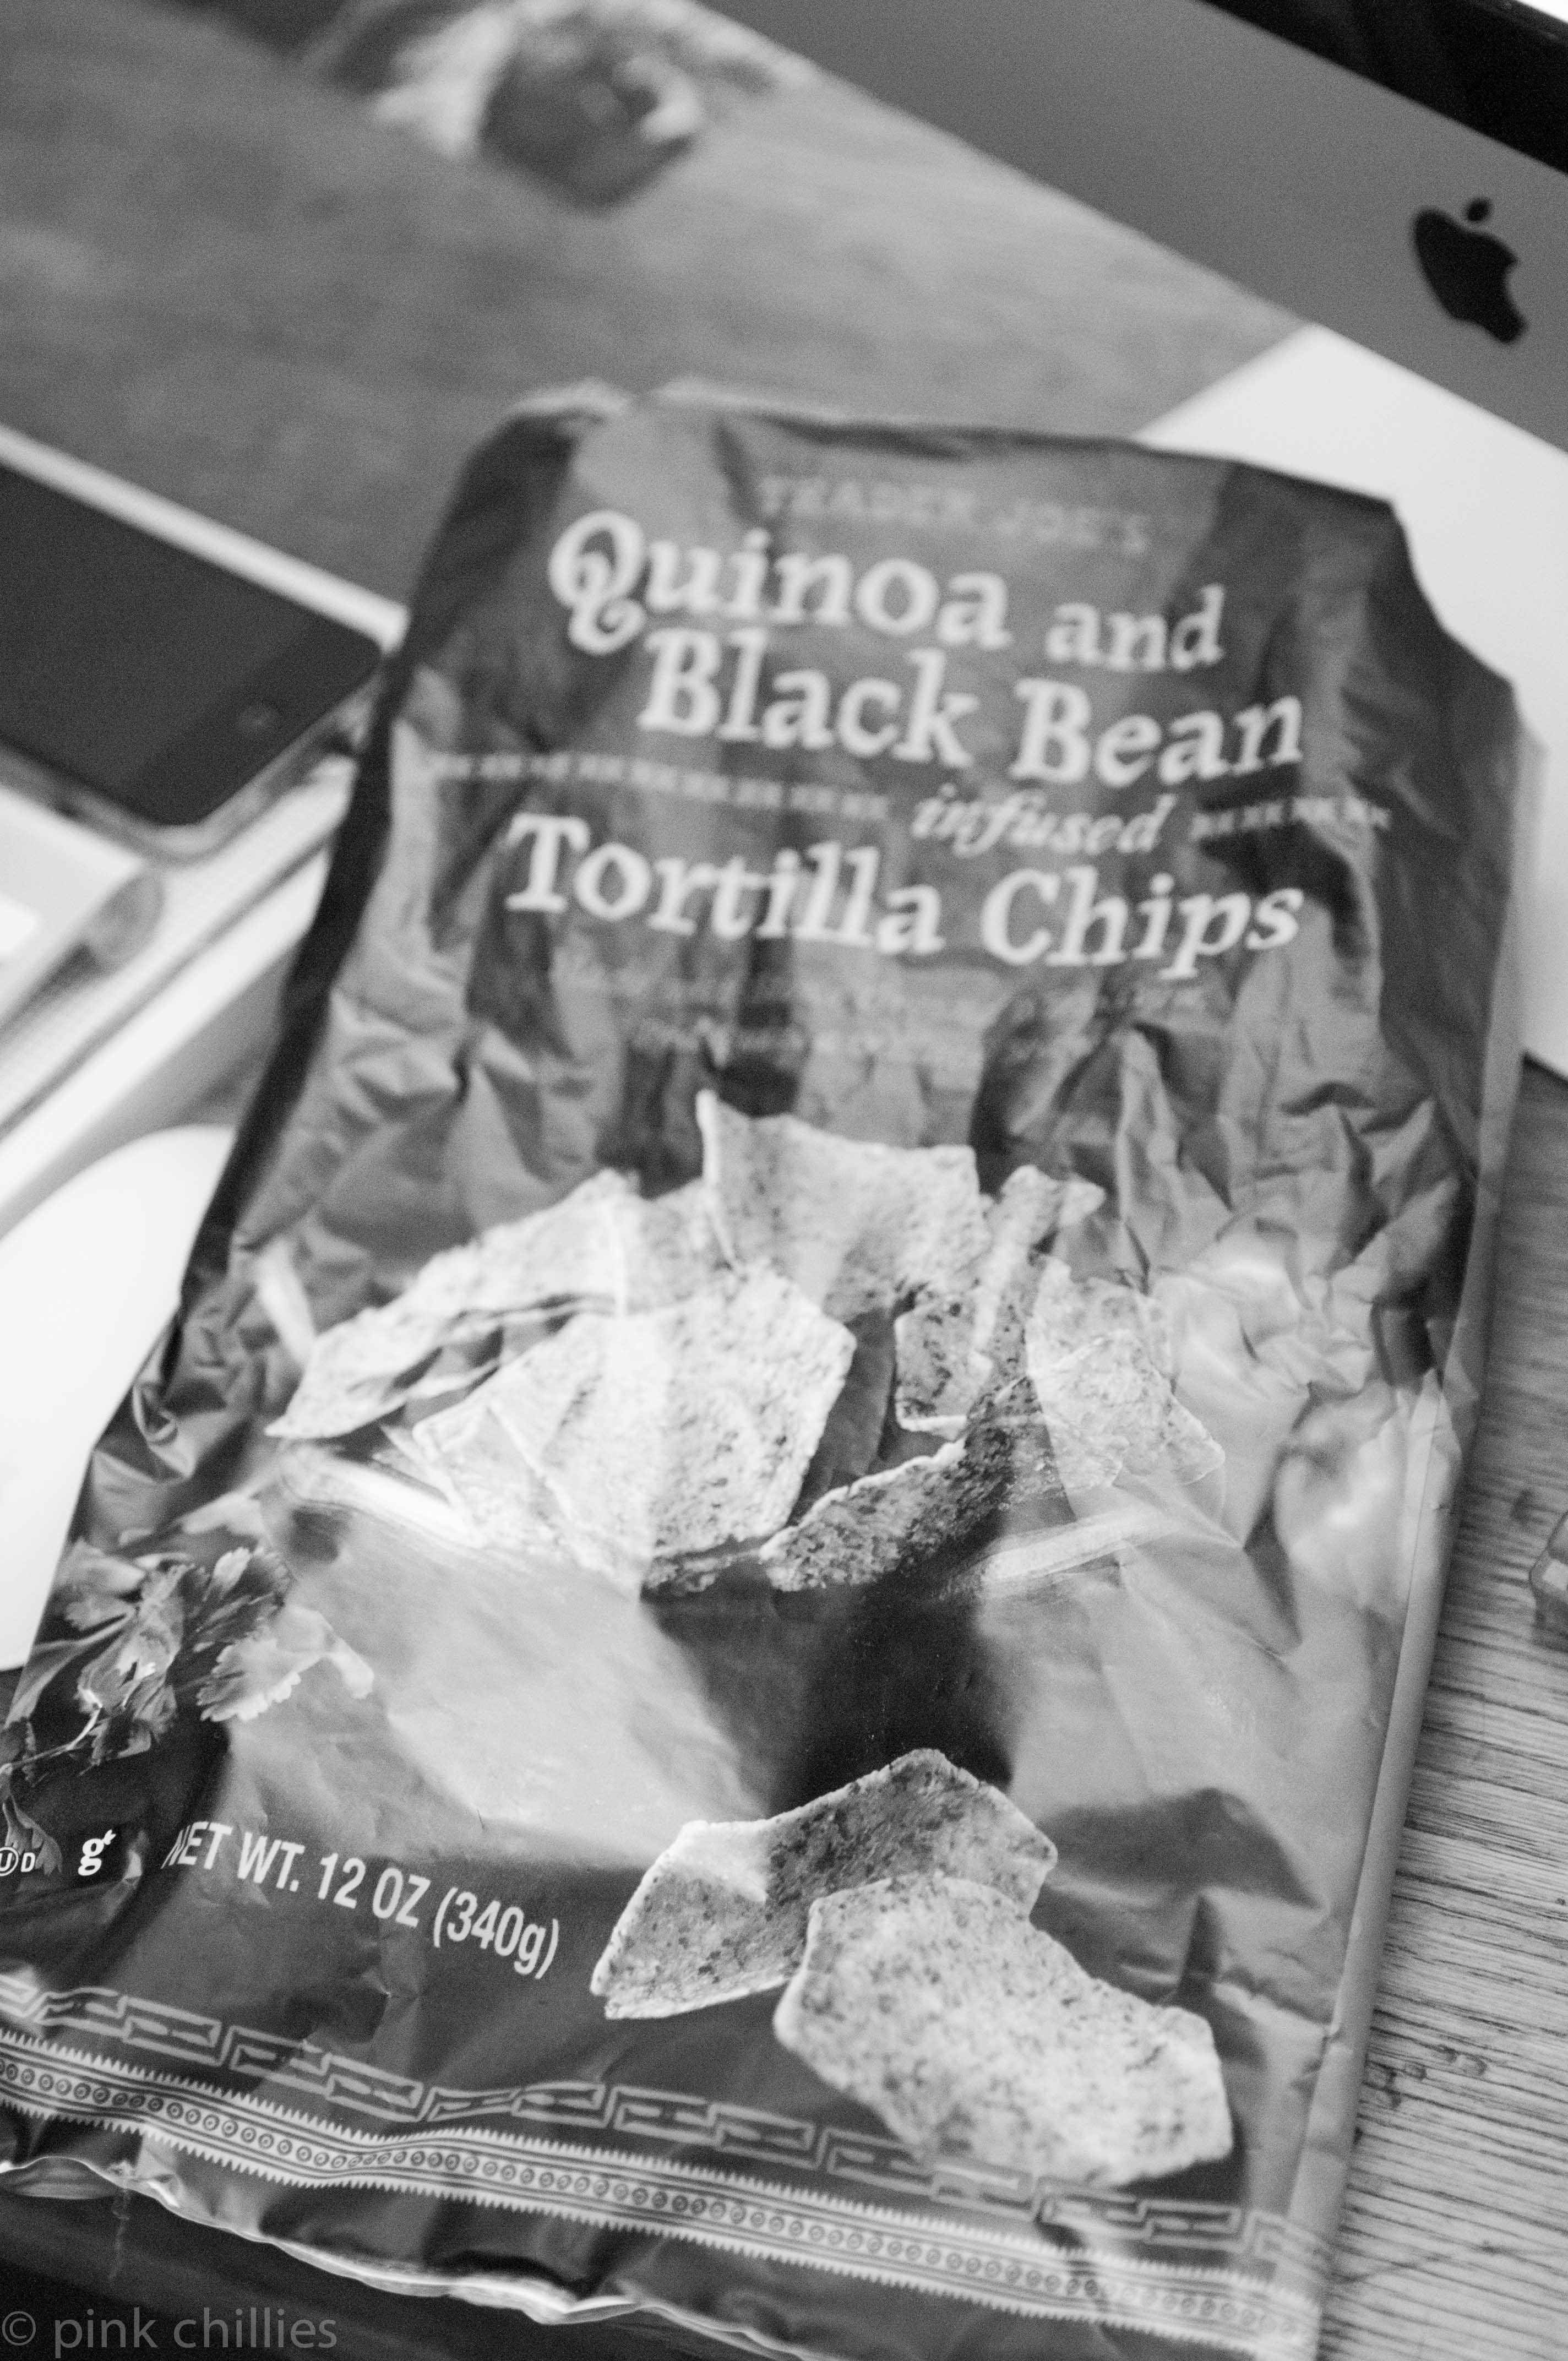 ZAJ_0554Quinoa and Black Bean Tortilia Chips